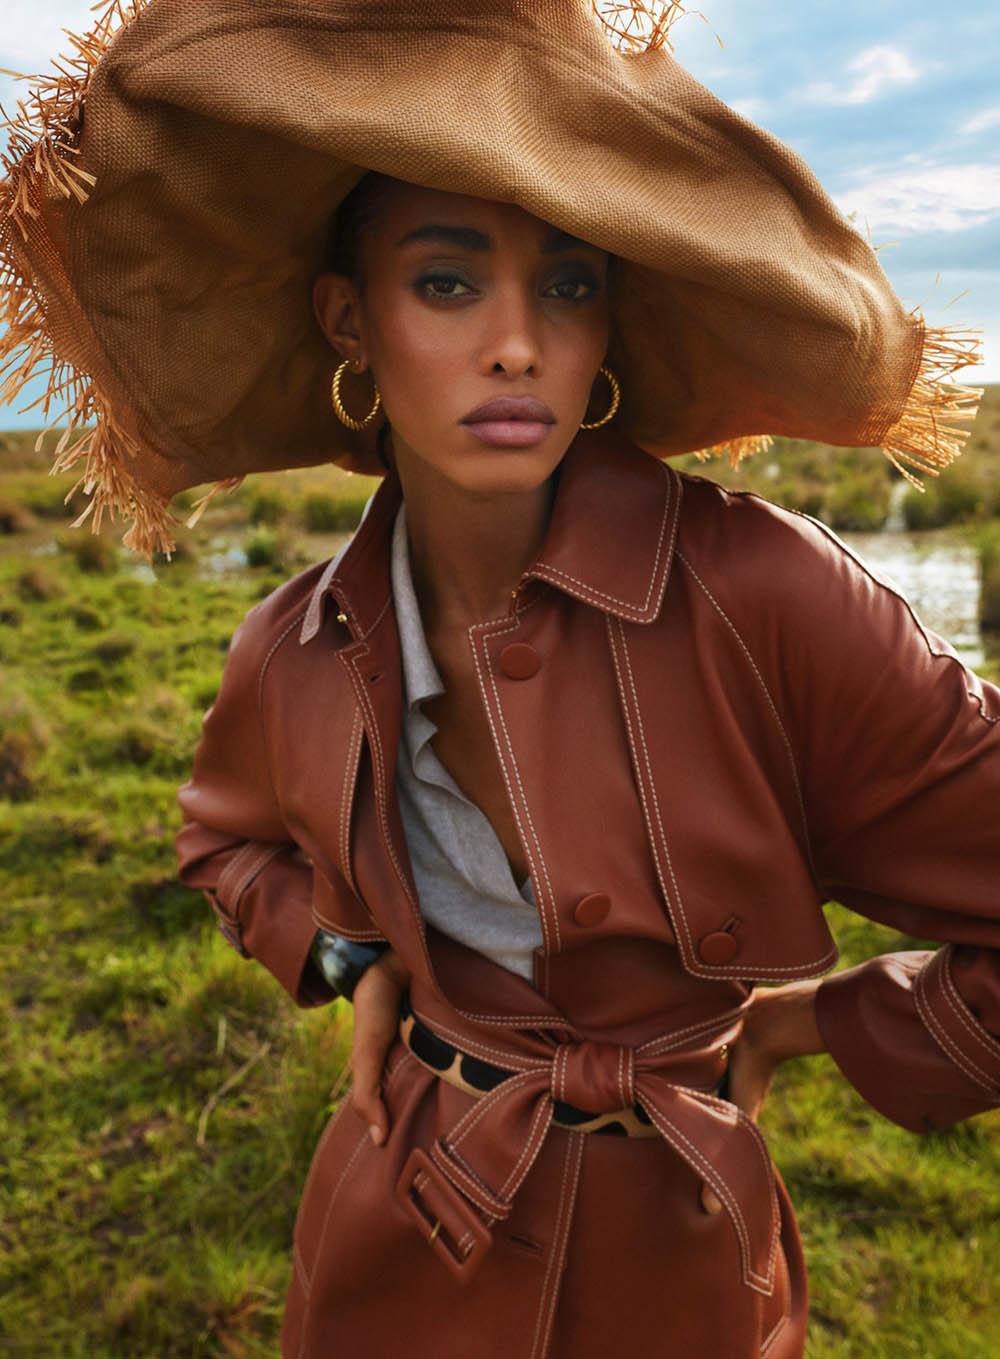 Samile Bermannelli by Morelli Brothers for Harper's Bazaar US April 2020